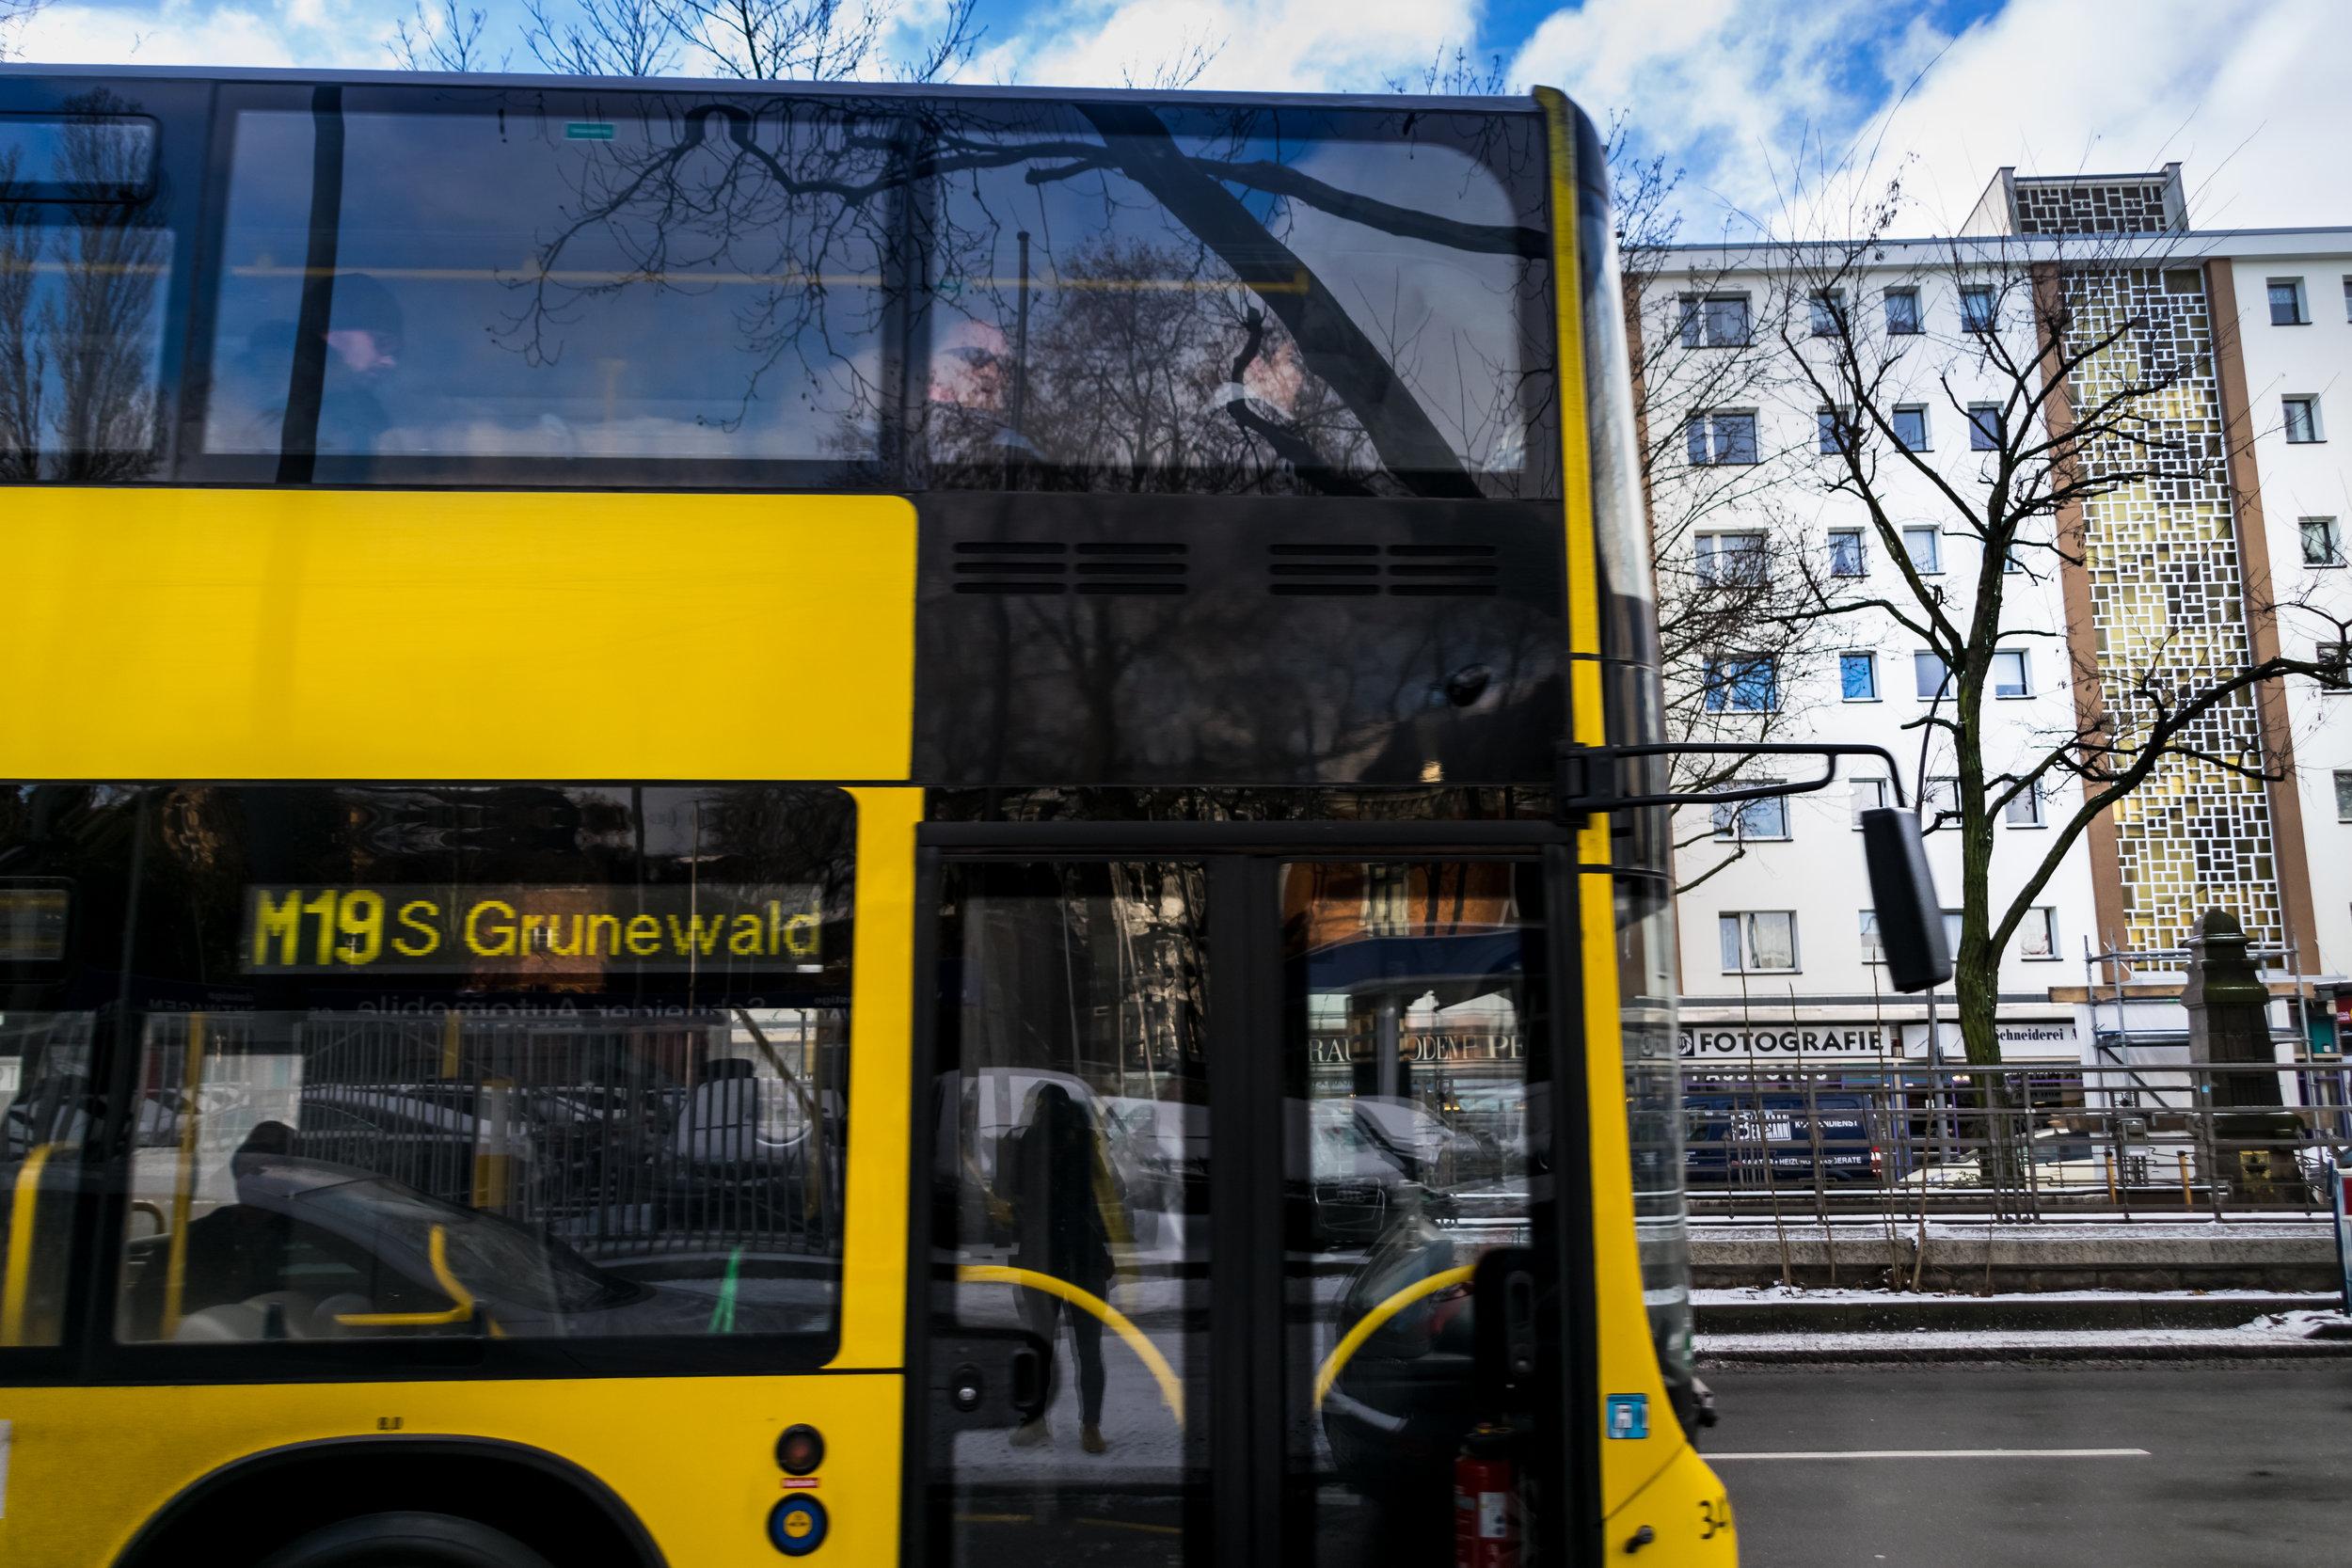 loving the double decker public buses